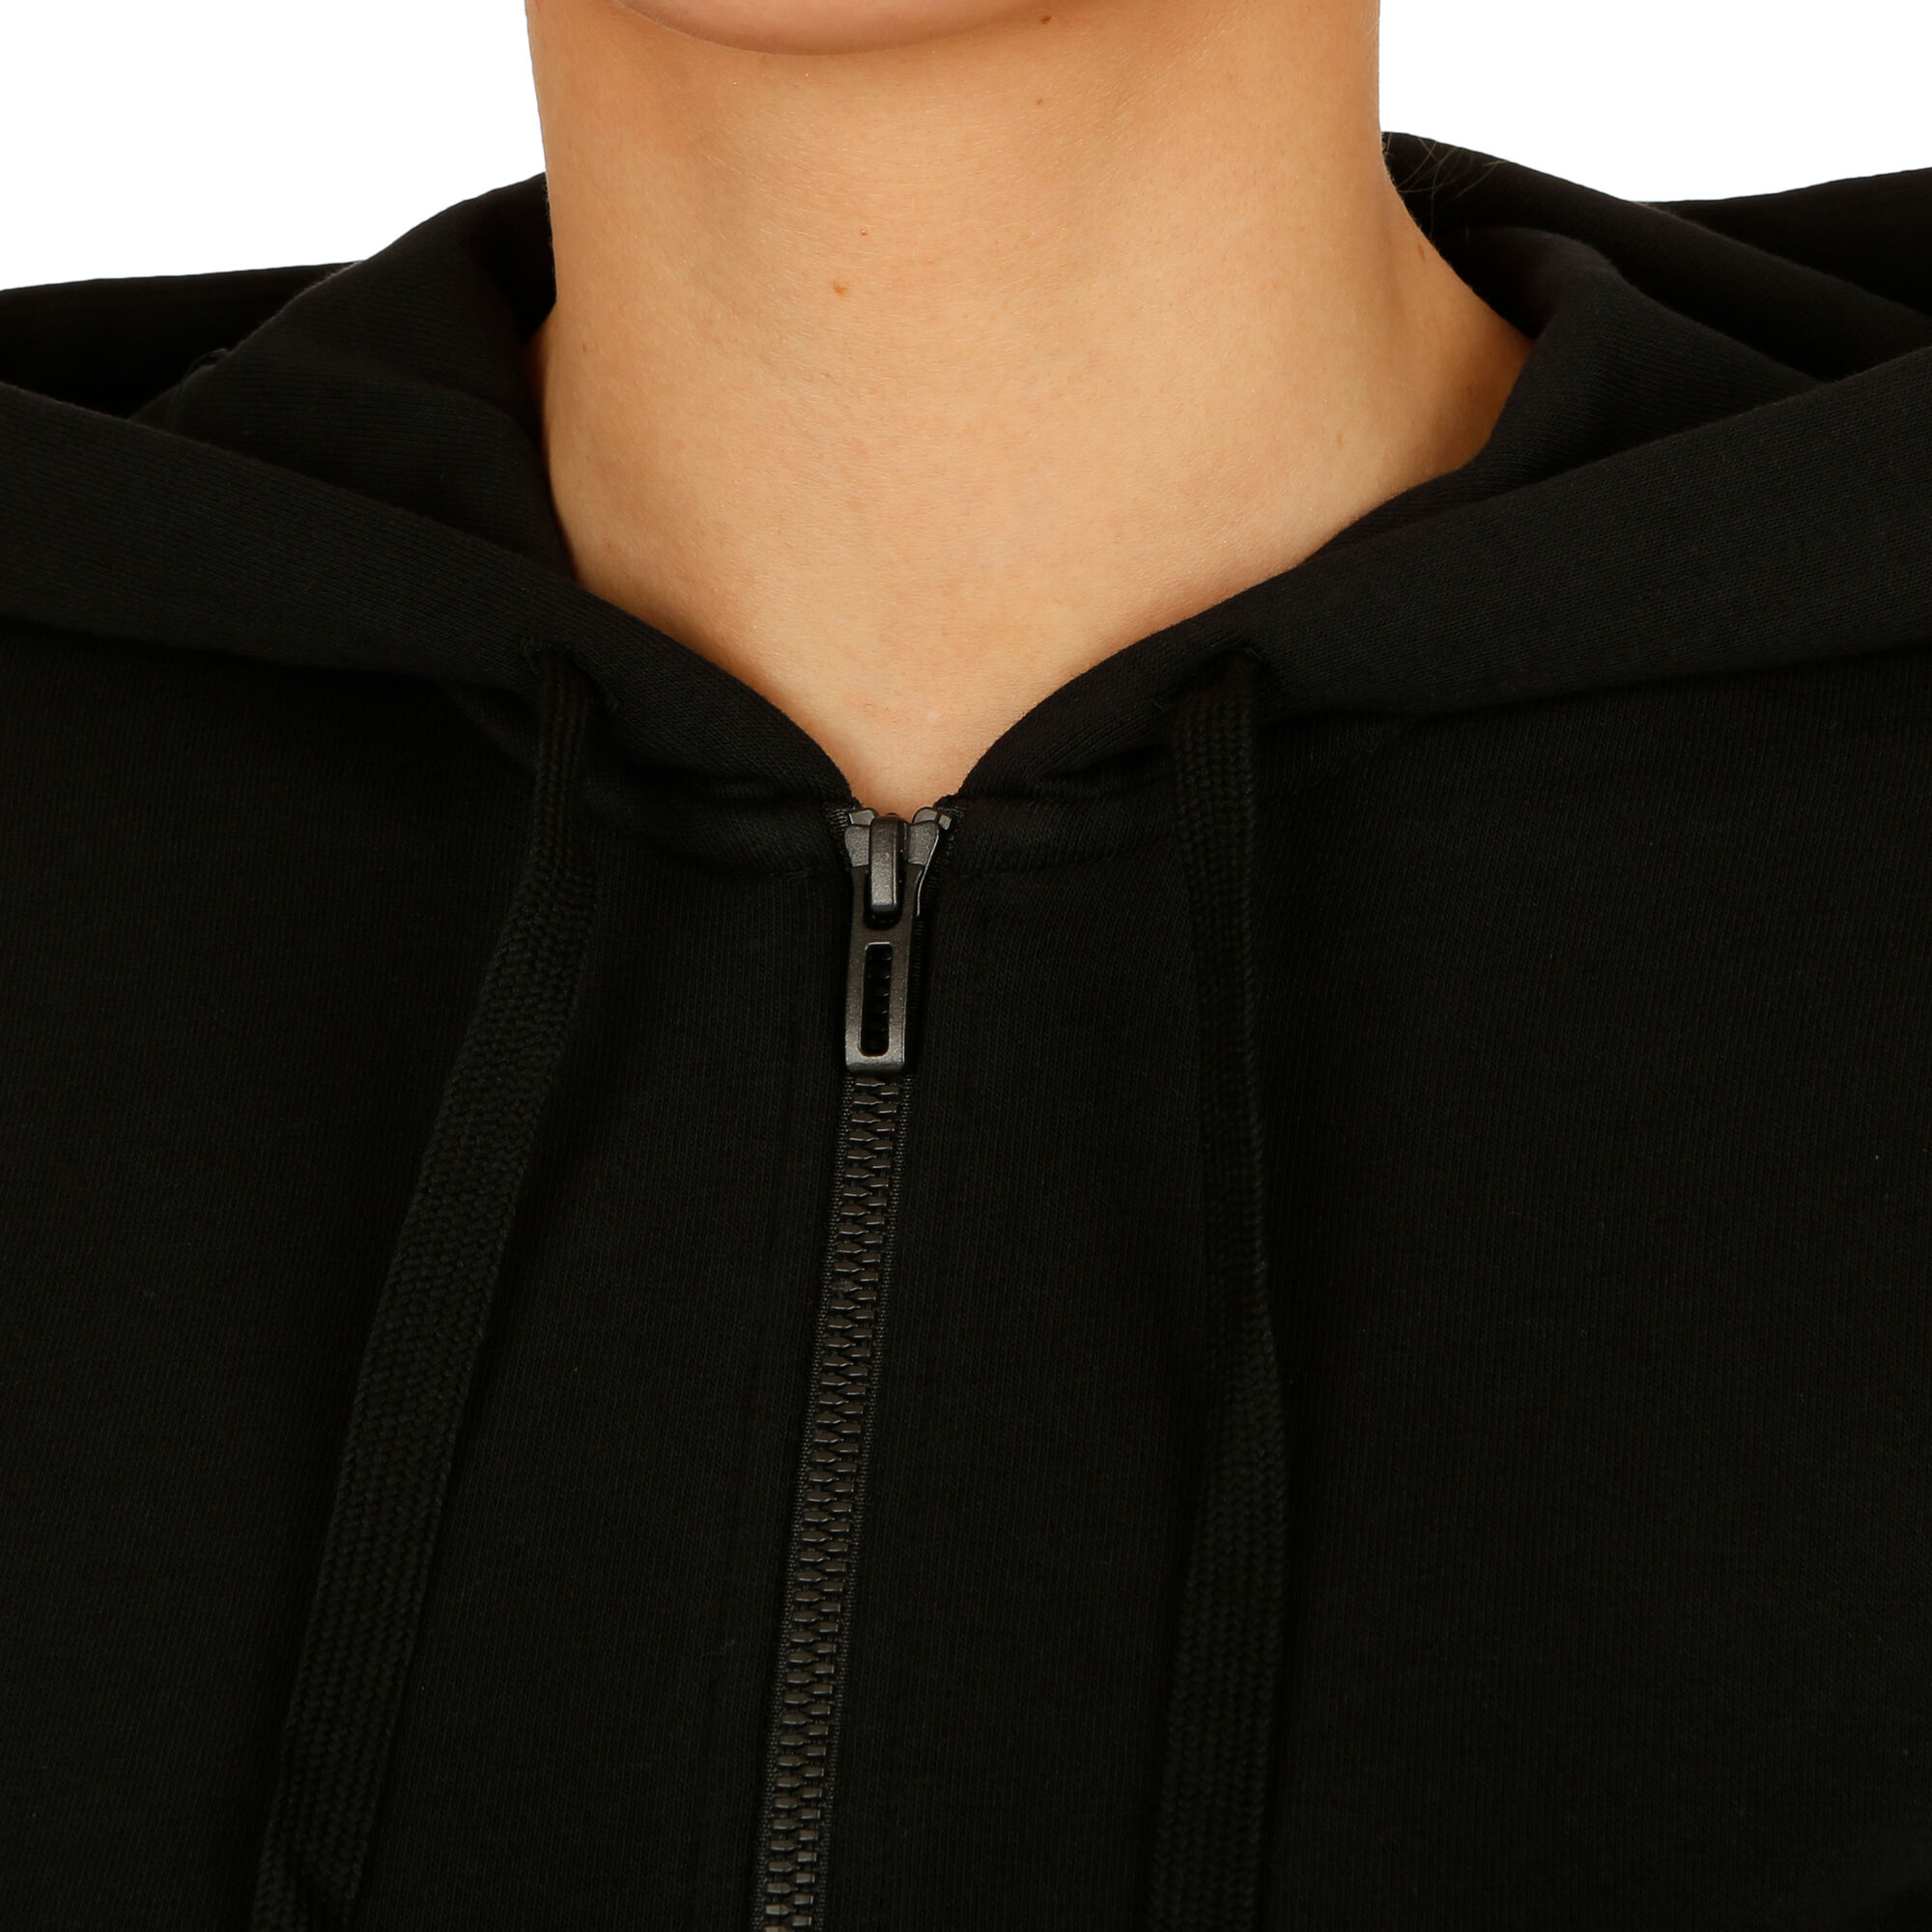 b8bc5f07fd73 adidas Essentials Linear Sweatjacke Damen - Schwarz, Weiß online ...